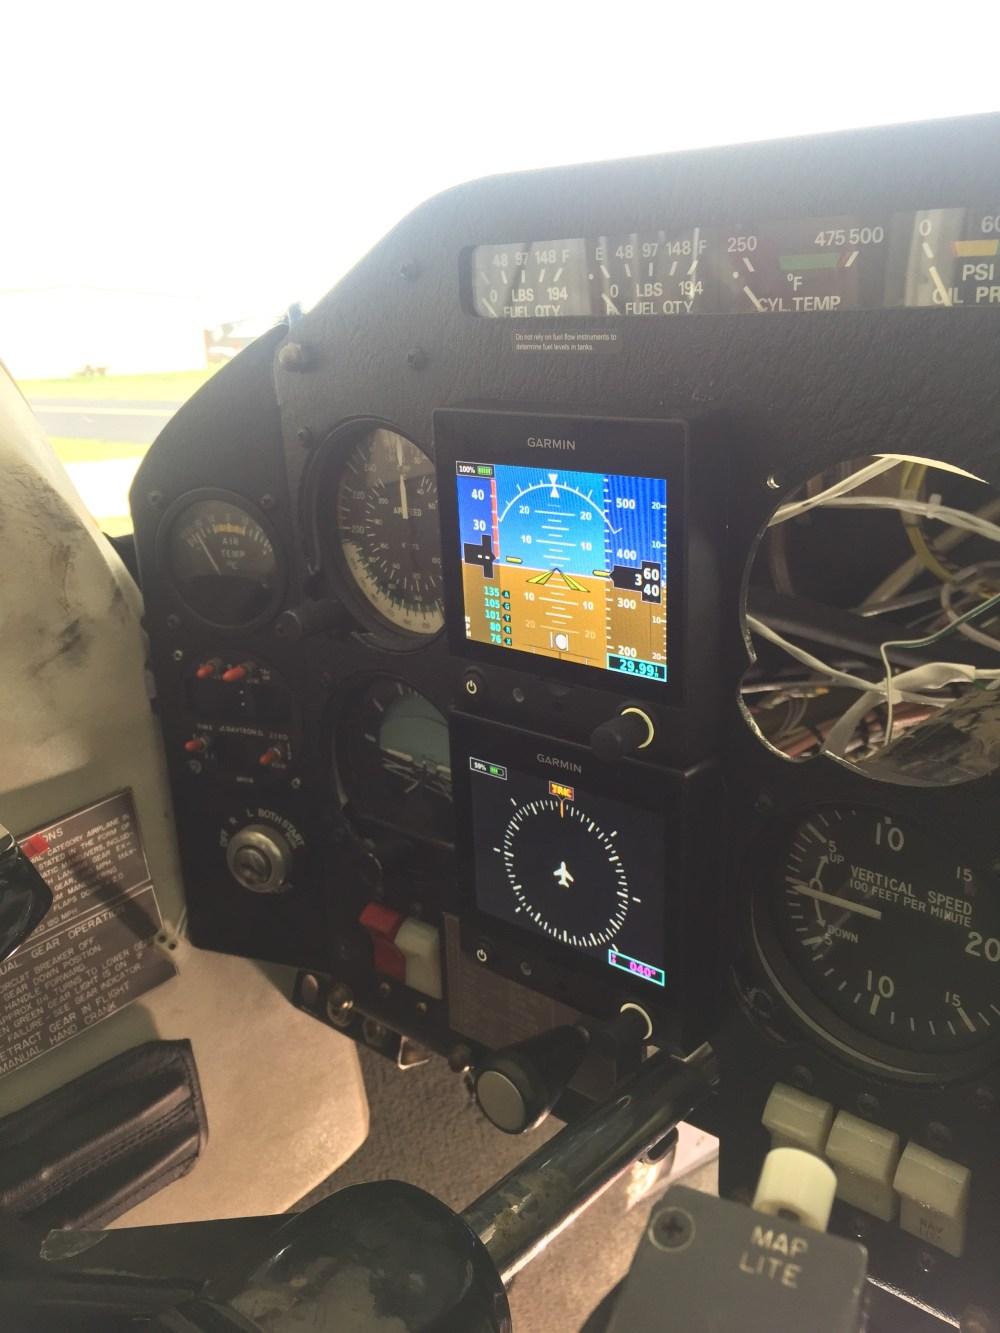 medium resolution of  aircraft wire harness redo on aircraft harness assembly aircraft tires aircraft bushing